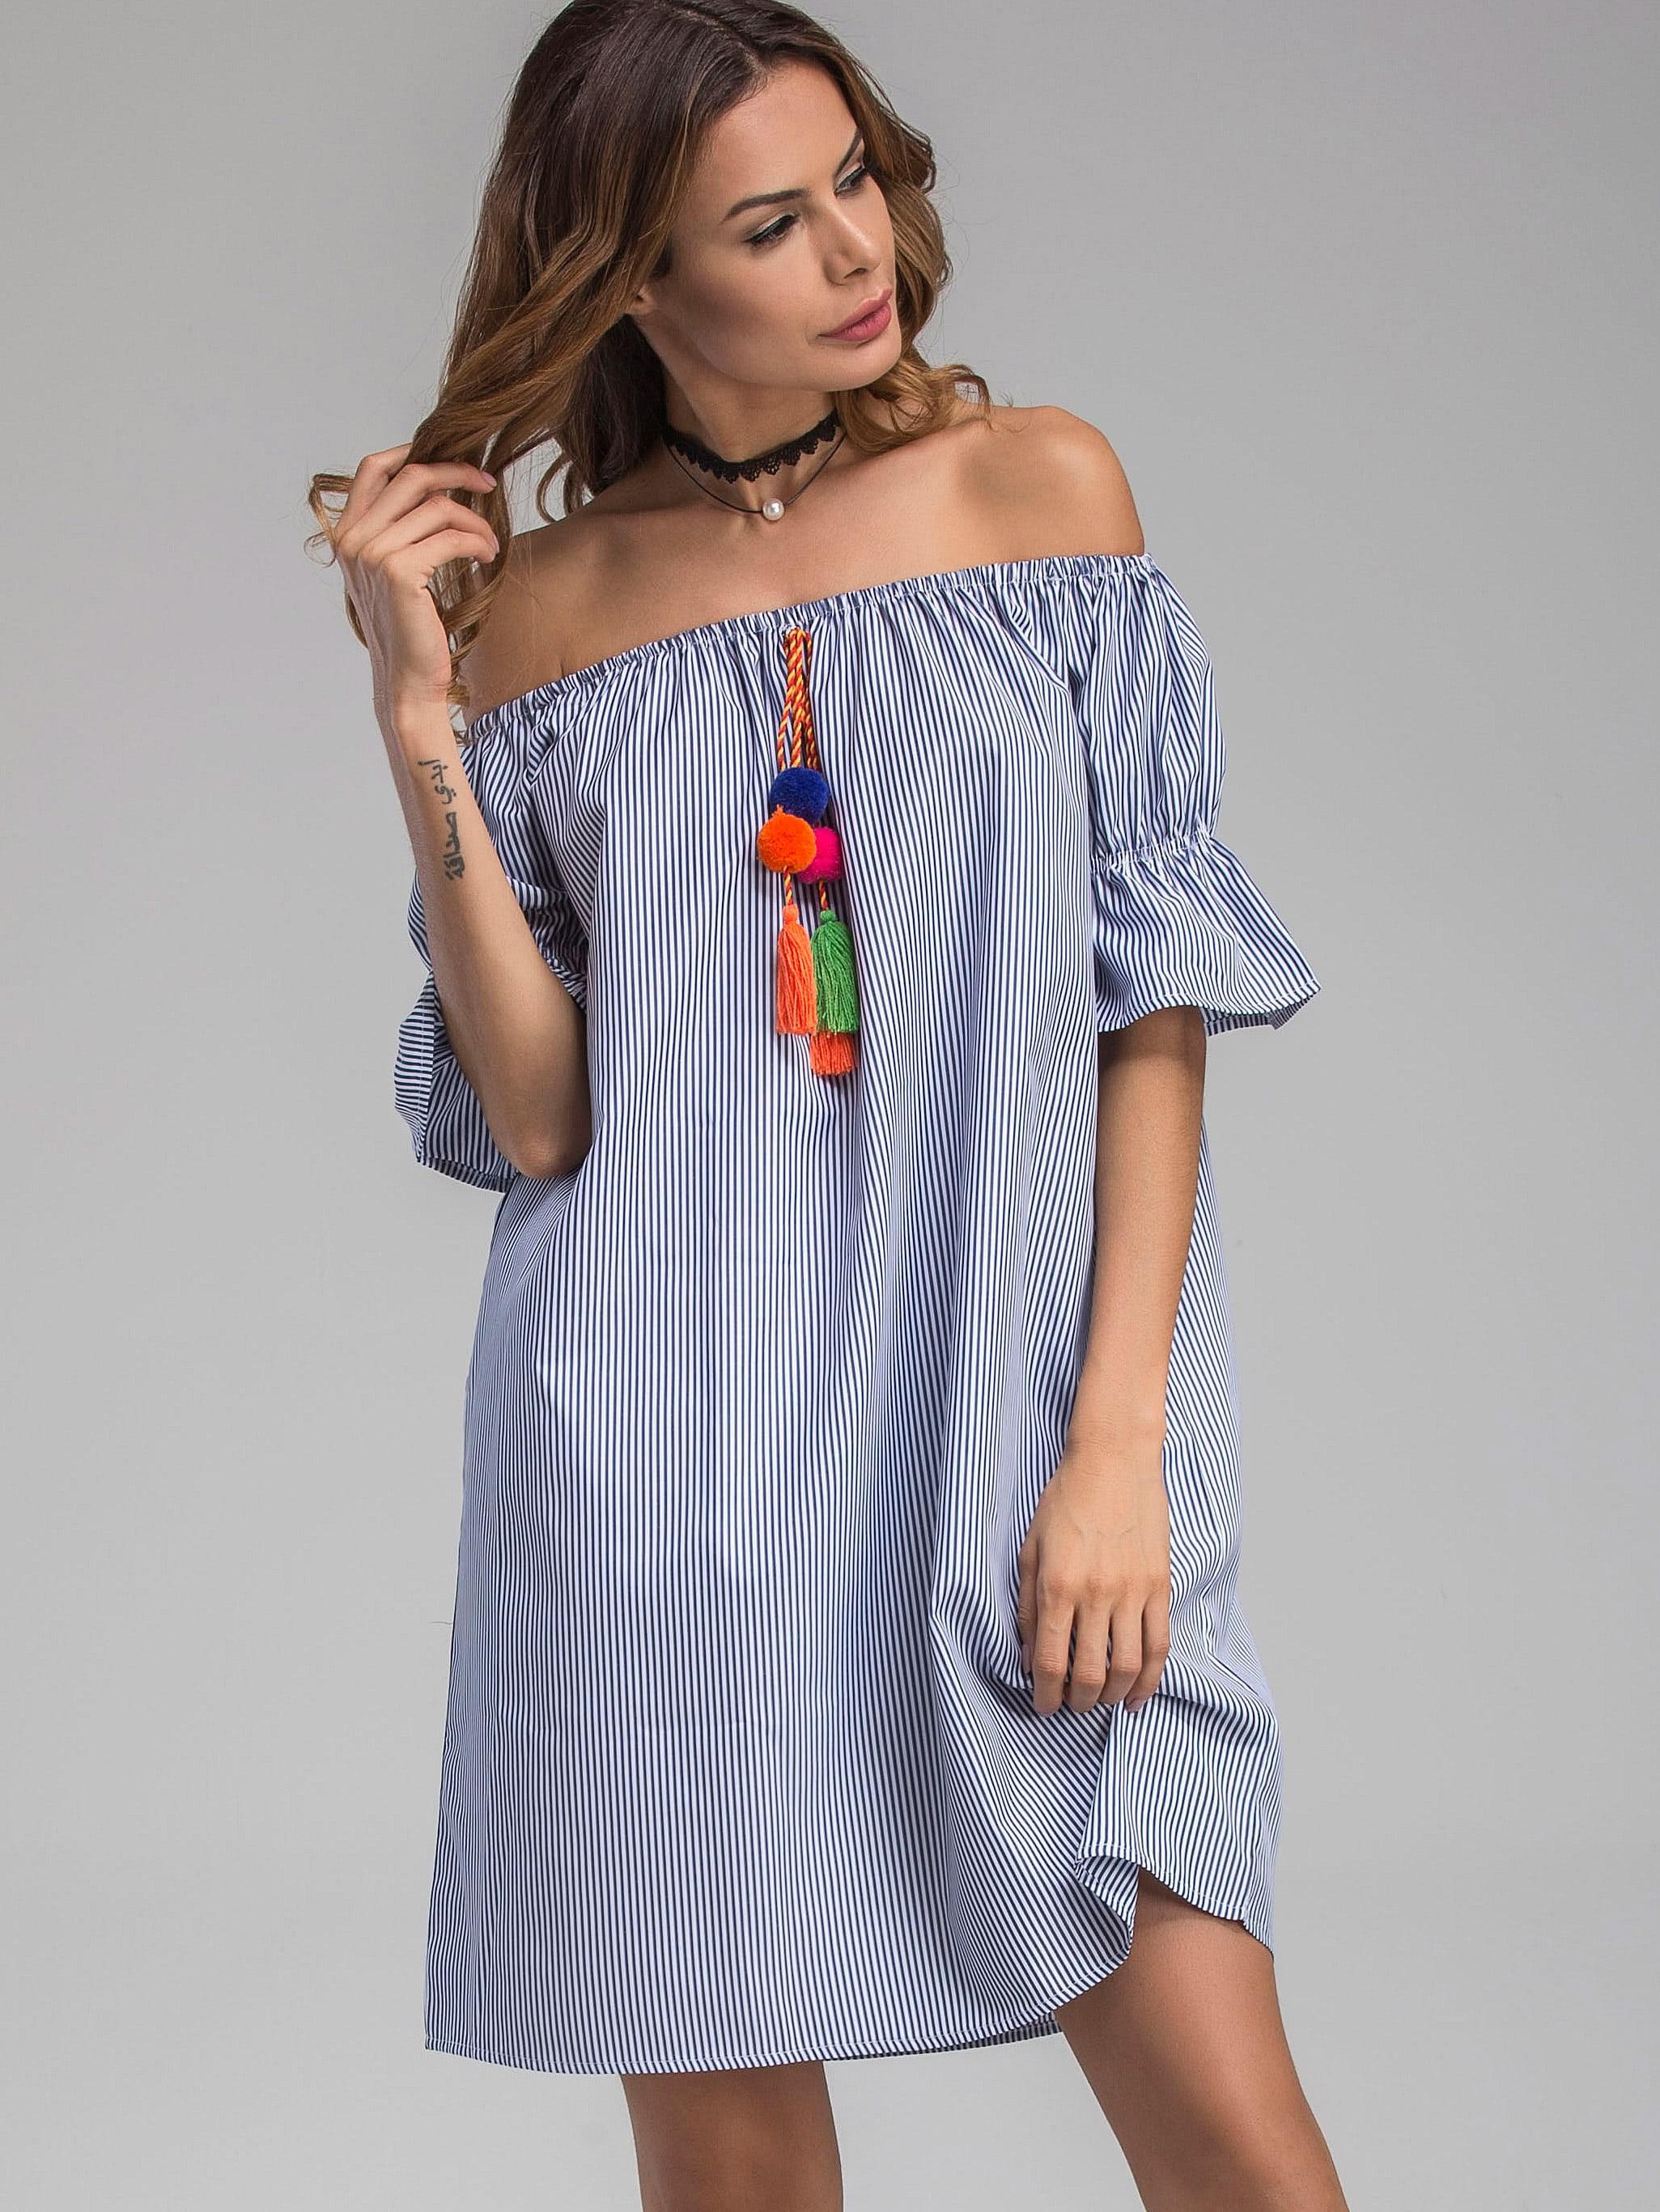 Фото Bardot Vertical Striped Bell Cuff Dress With Pom Pom. Купить с доставкой